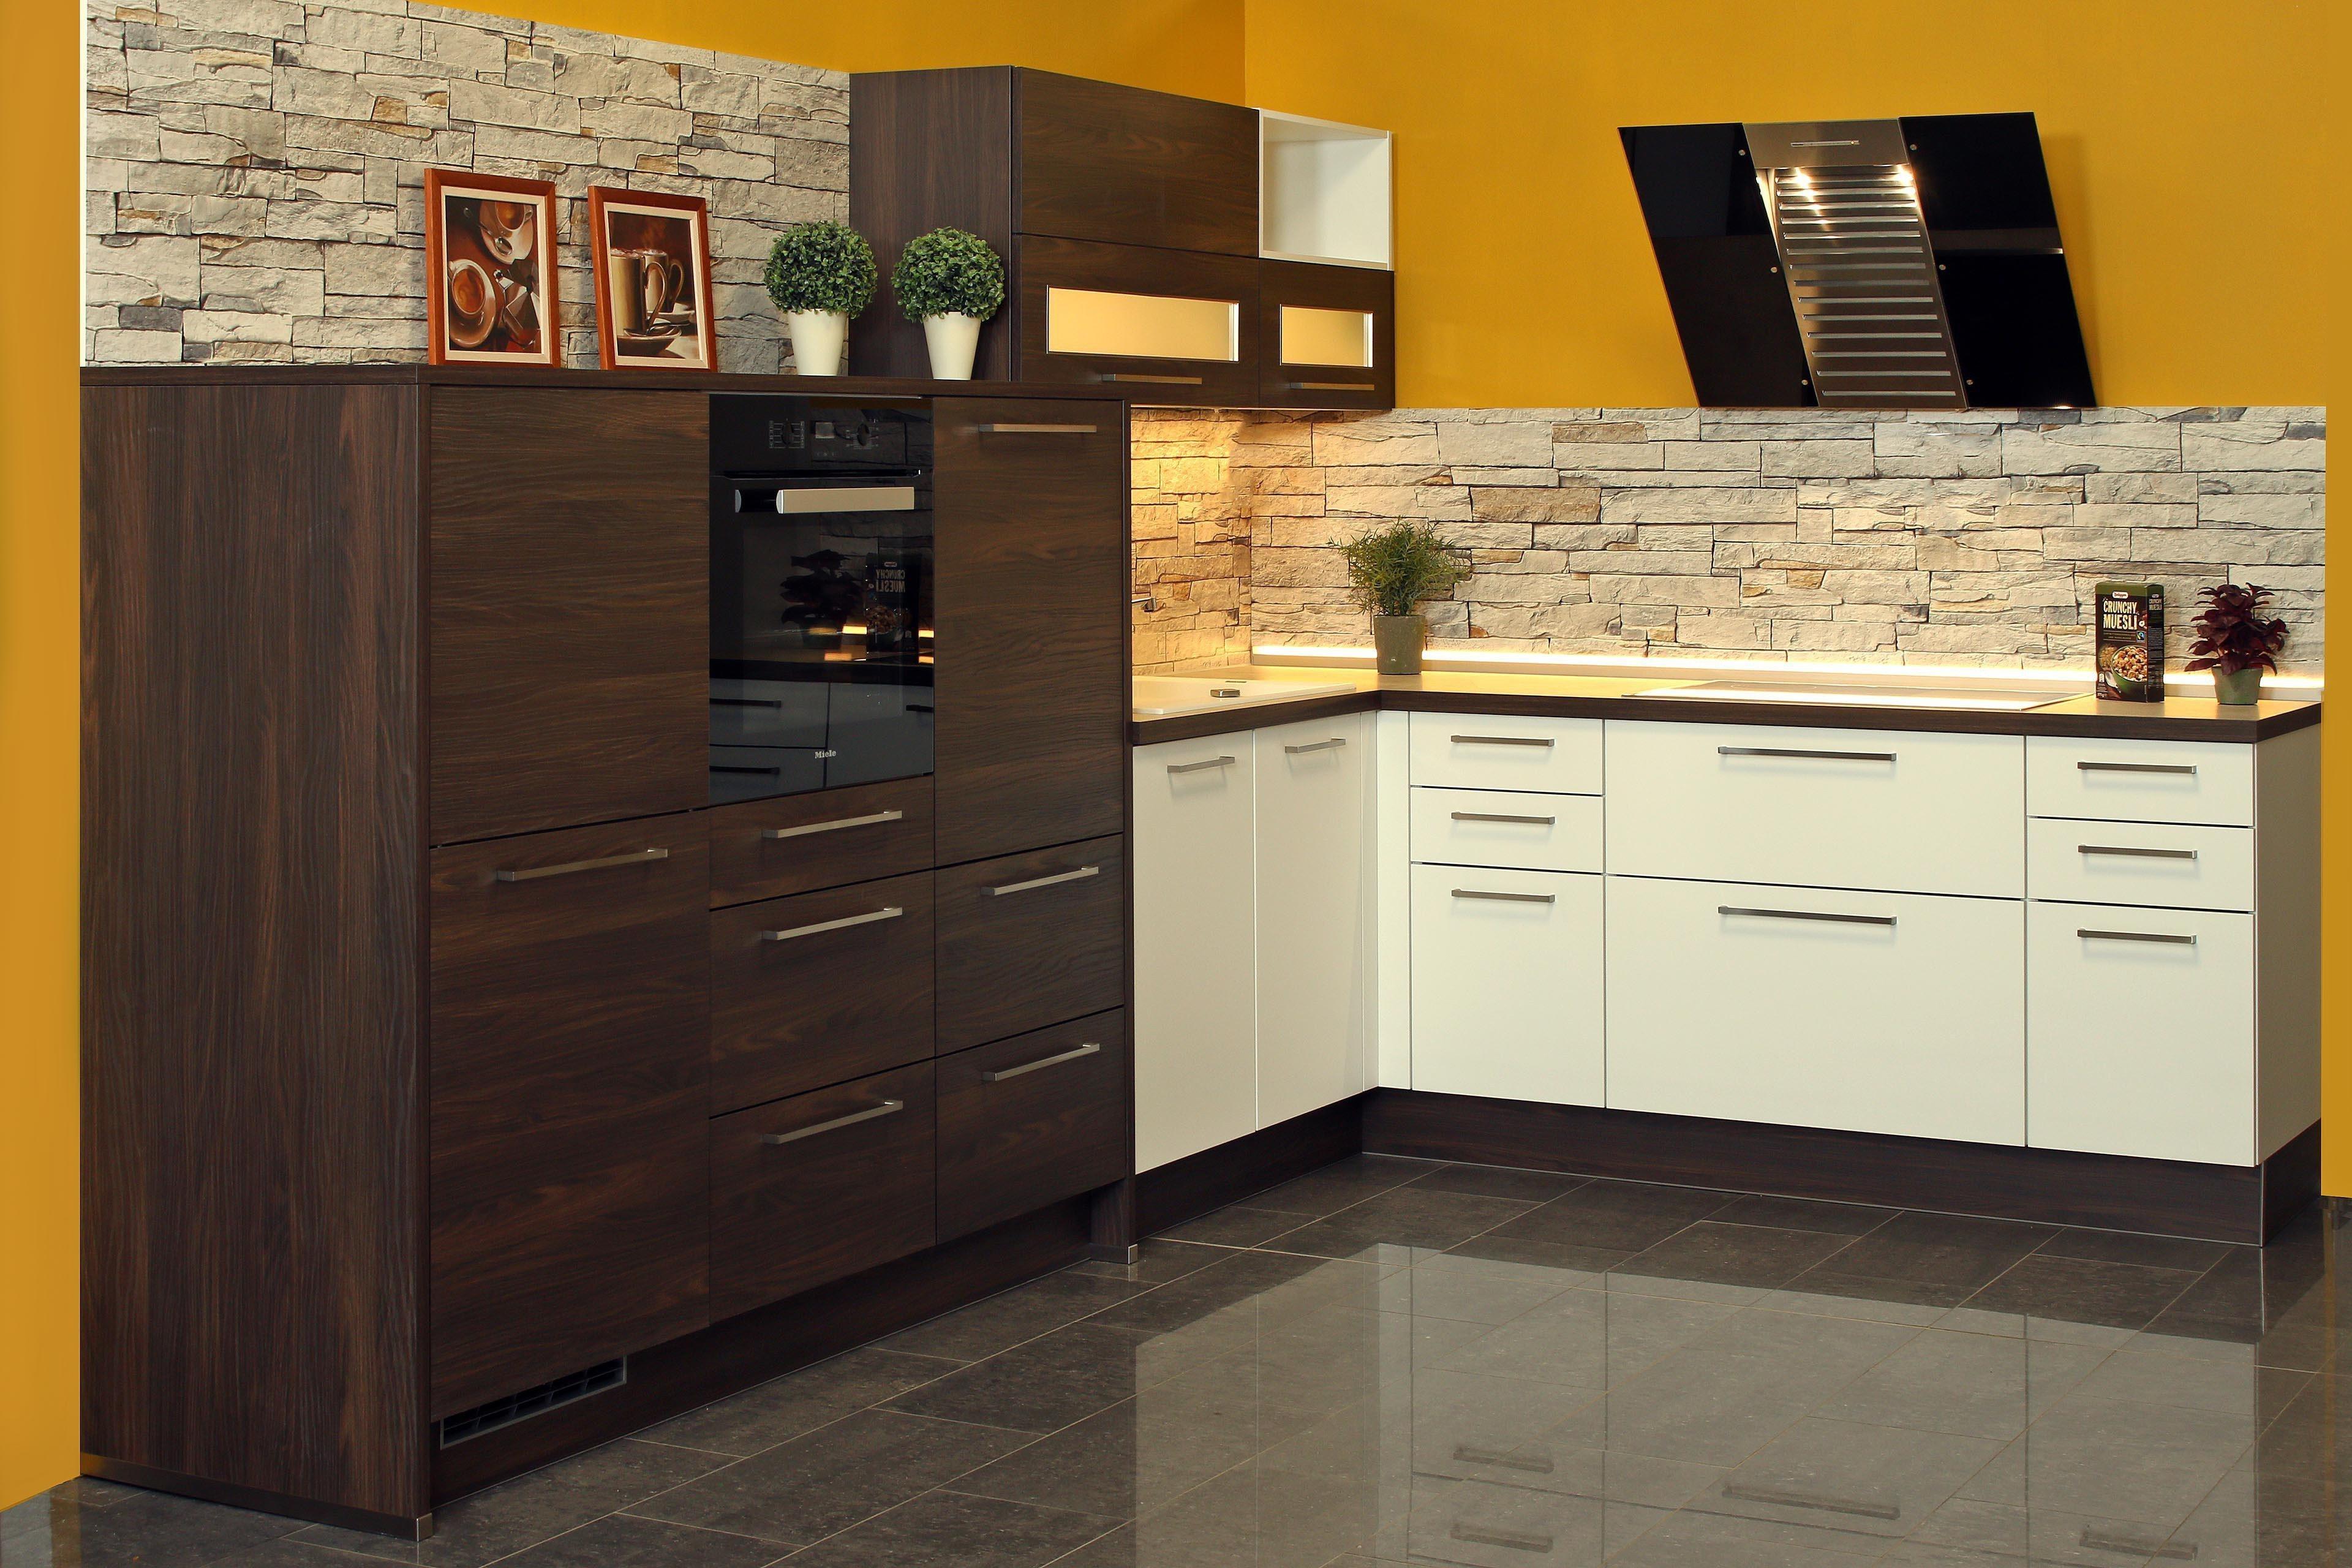 nolte k che online kaufen home design ideen. Black Bedroom Furniture Sets. Home Design Ideas